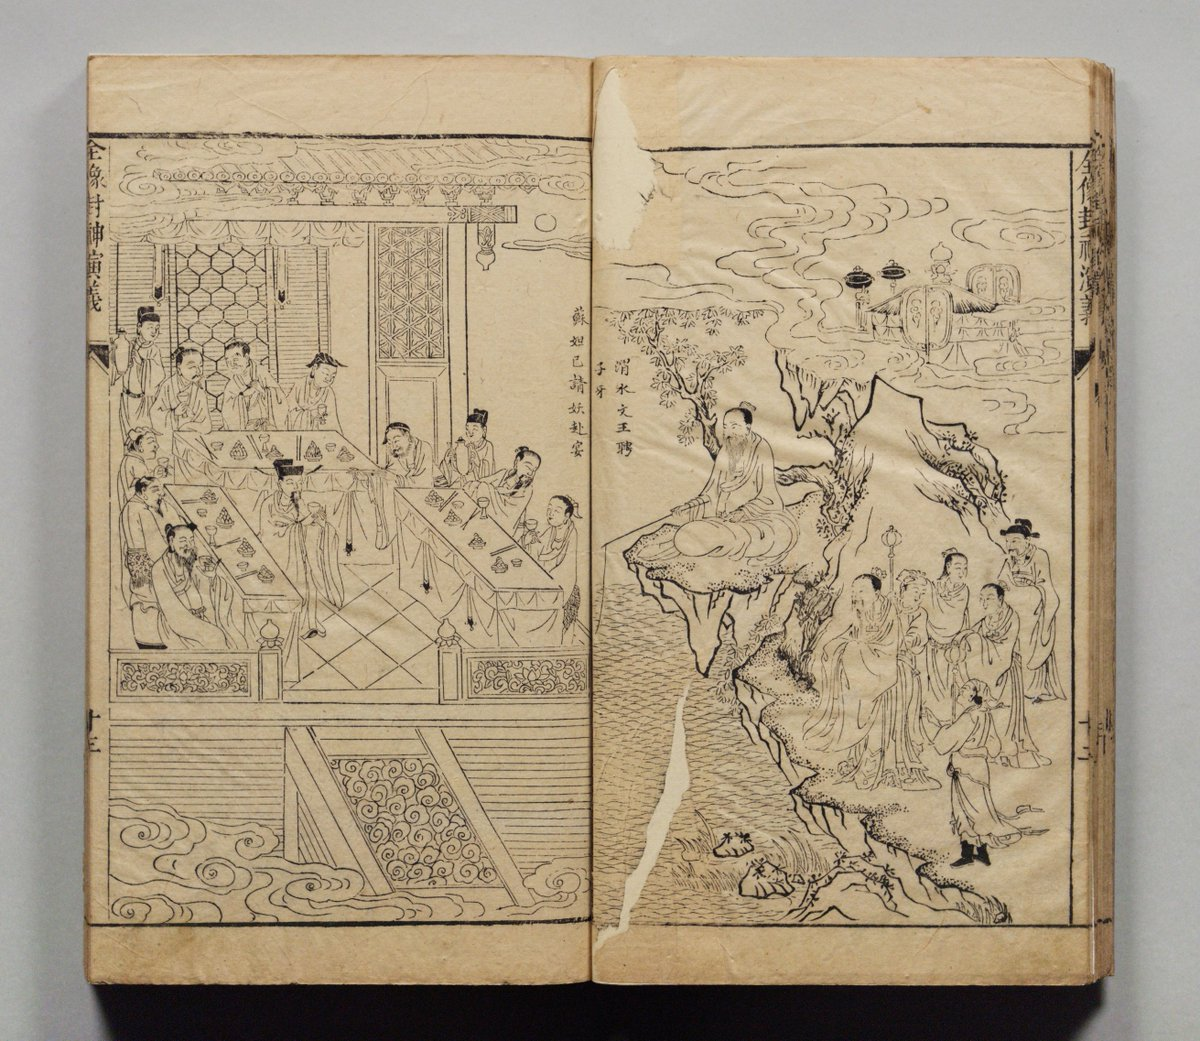 test ツイッターメディア - 右が、明の時代の『封神演義』の姜子牙が釣りをしているところを文王・姫昌が訪れる有名なシ-ン。イラストは左右二枚で見開きになっていた。(国立公文書館蔵) https://t.co/1jmcf1LUcI